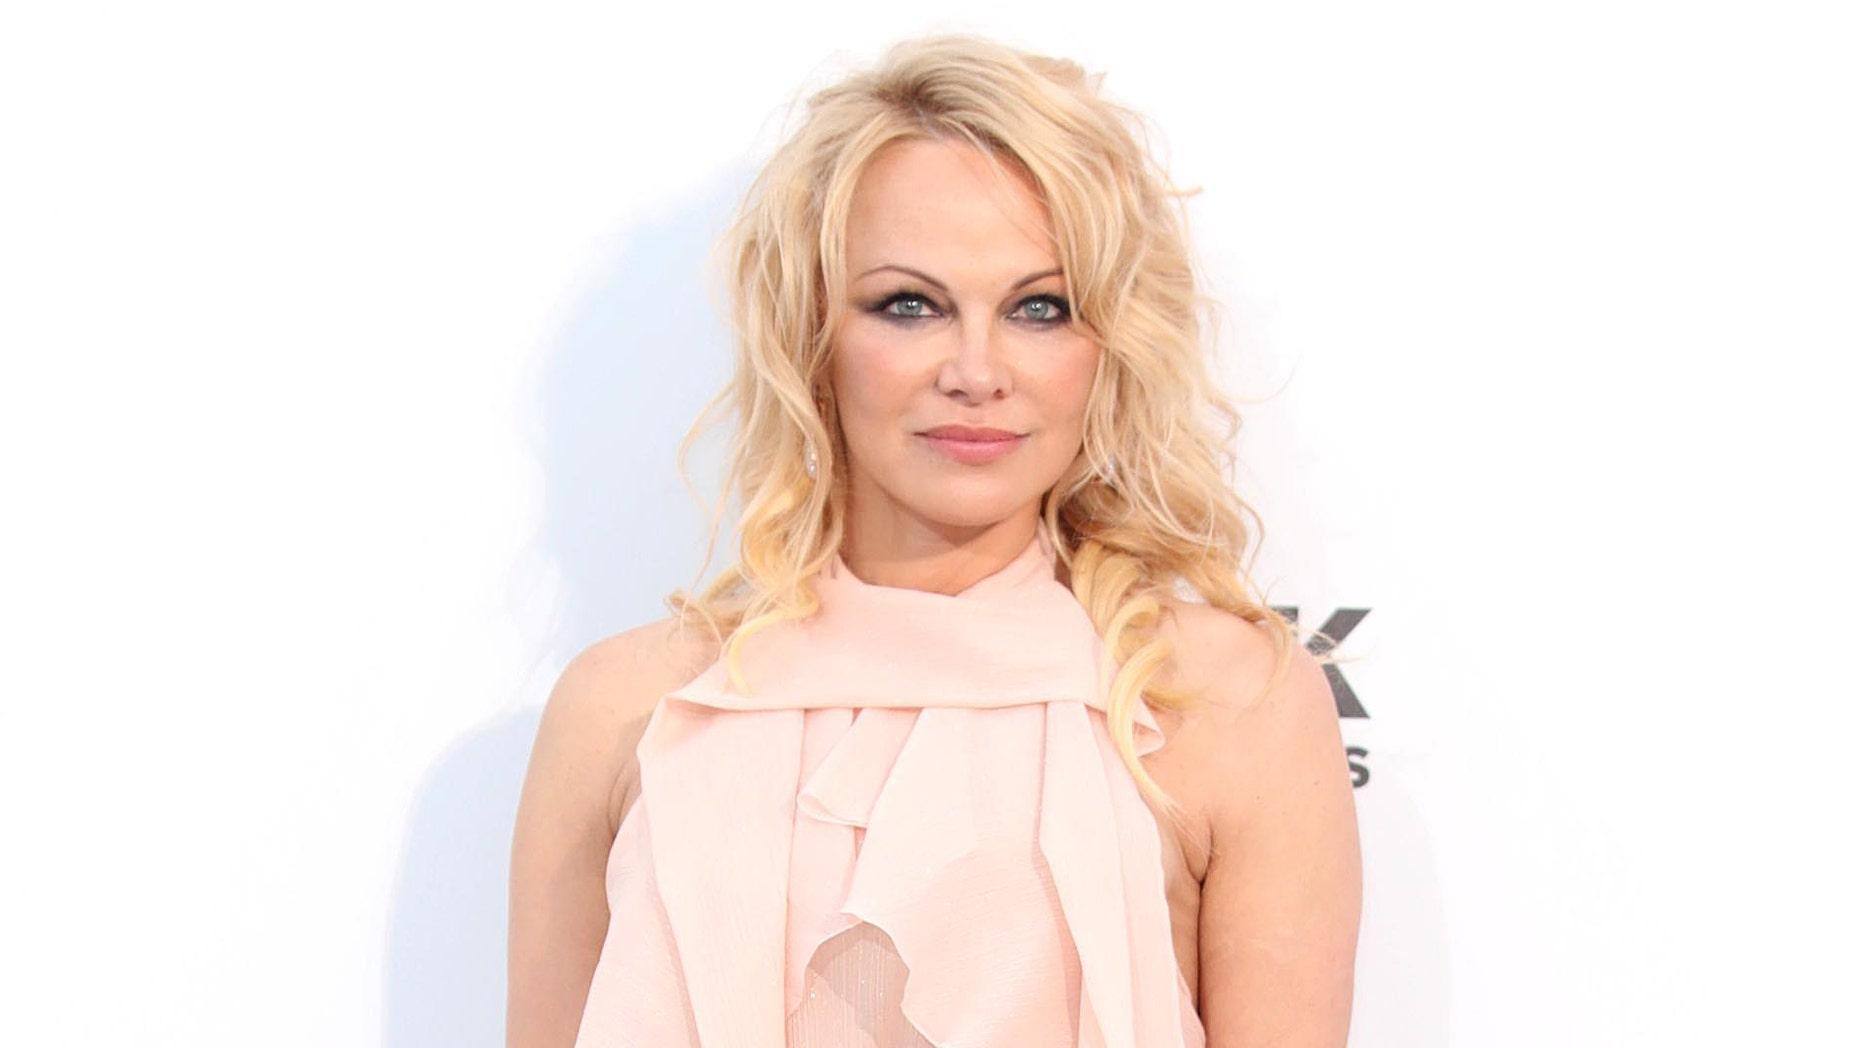 Pamela Anderson marries her bodyguard in intimate Christmas wedding